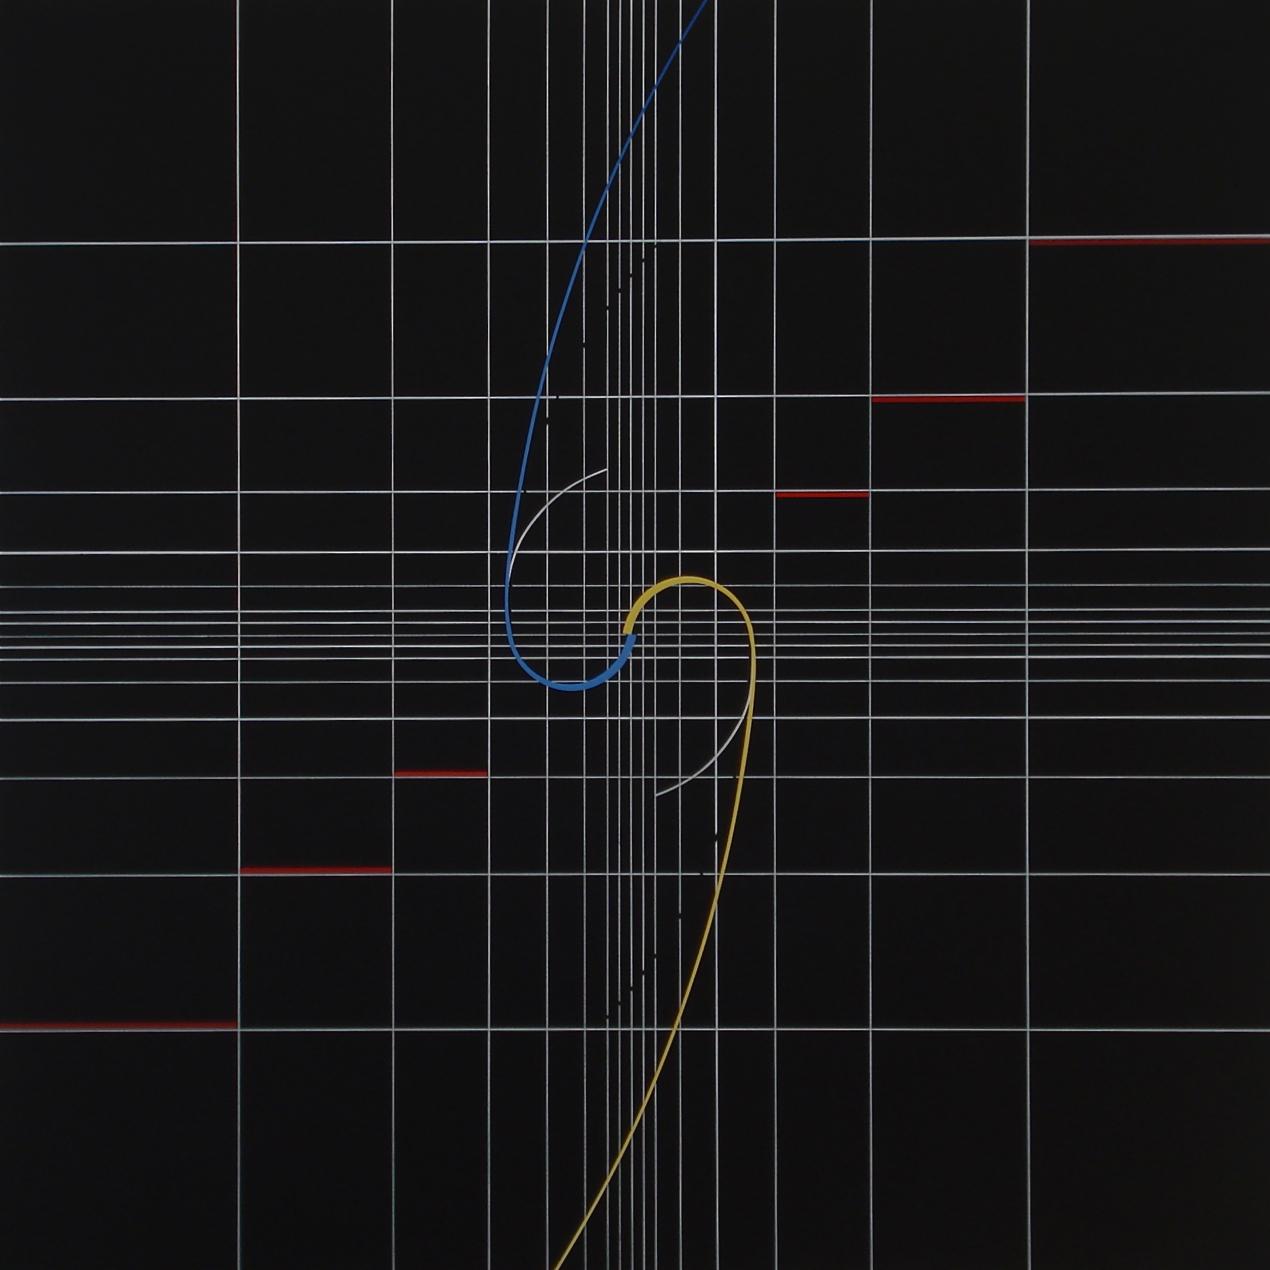 Yantra-ipsum-samsara(1)2011.Sep acrylic on canvas, 23 5/8 x 23 5/8 in. [60x60cm]